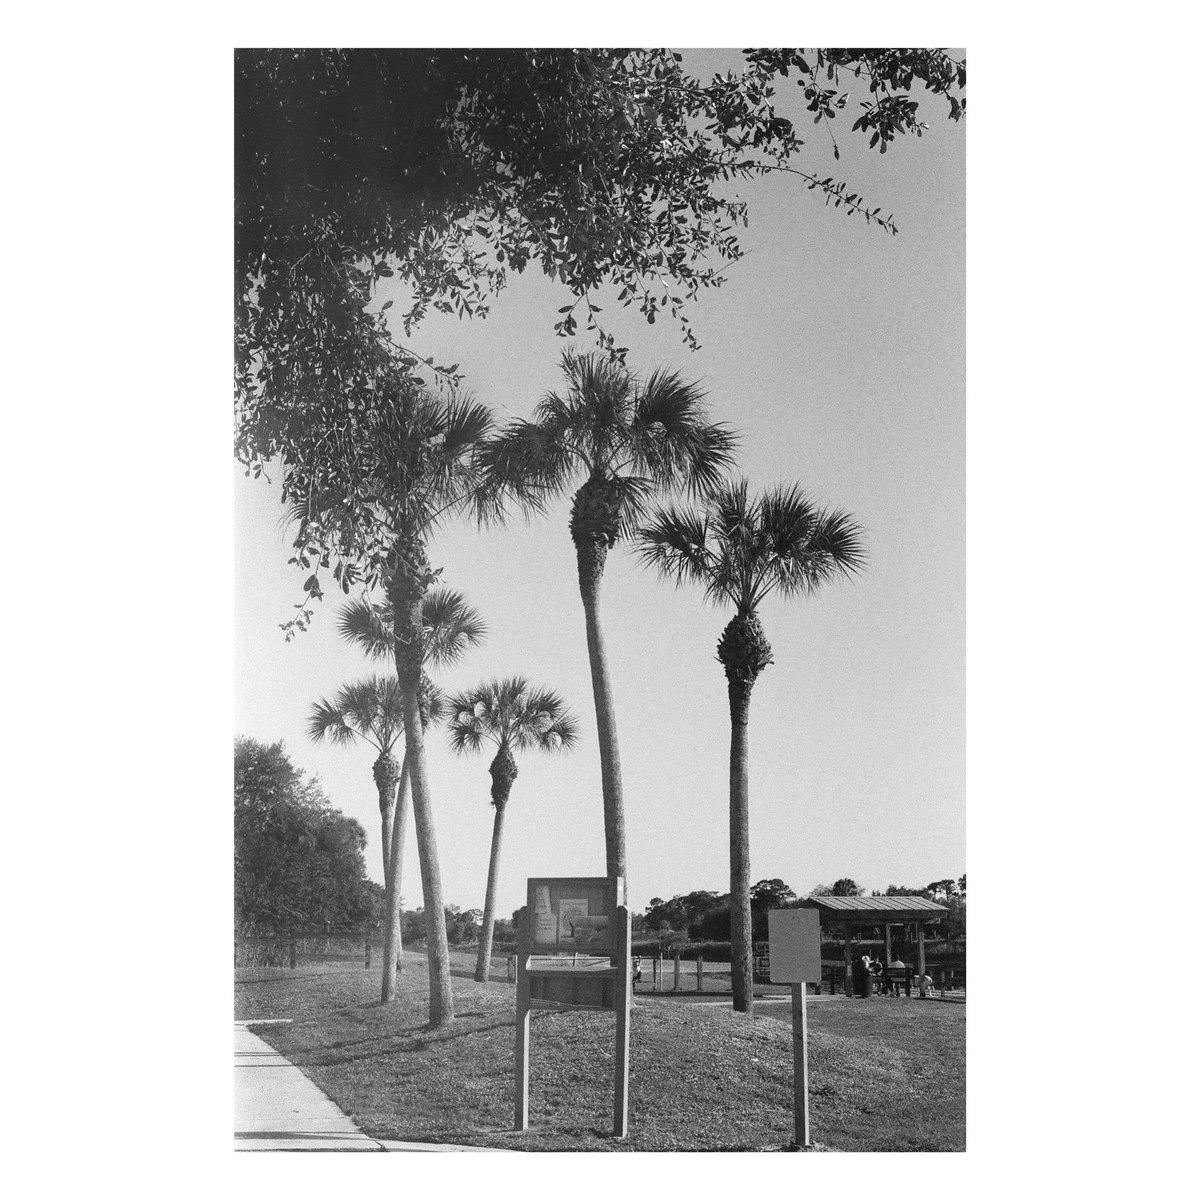 Oak Hammock Park Canon FTb  Kodak TriX 400 #istillshootfilm #thefilmcommunity #35mm #analogfeatures #filmisalive #filmisnotdead #AlysVintageCameraAlley #boxspeed #filmPhotography #filmphotographyProject #blackandwhitephotography #womenwithanalogcameras #filmshooterscollective pic.twitter.com/3ZcRfiJZ9N